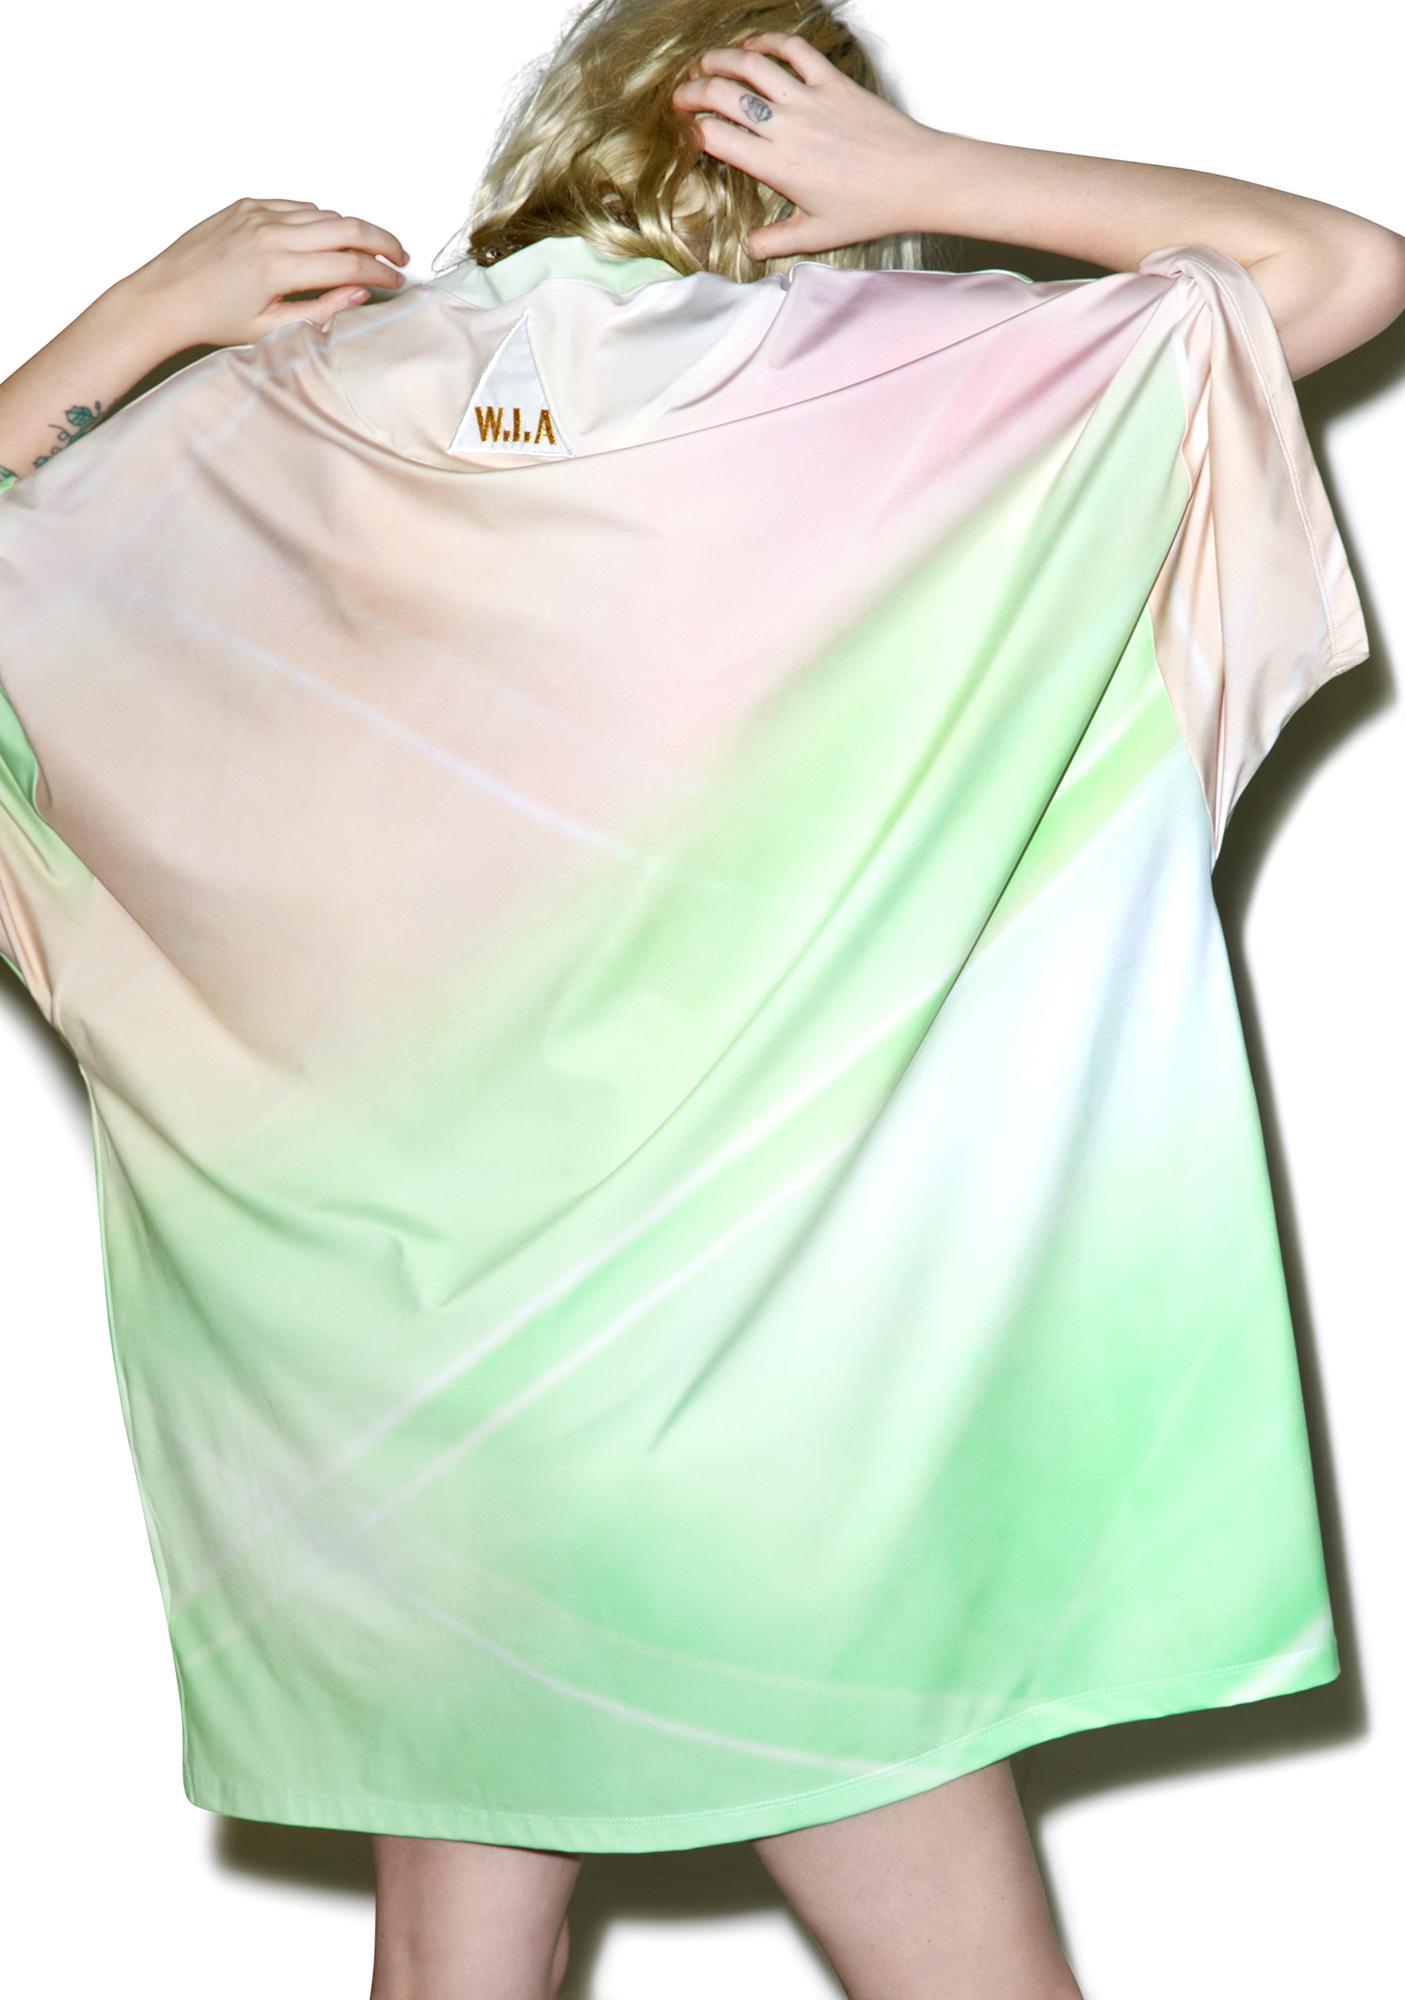 W.I.A Diamond Extra Big T-Shirt